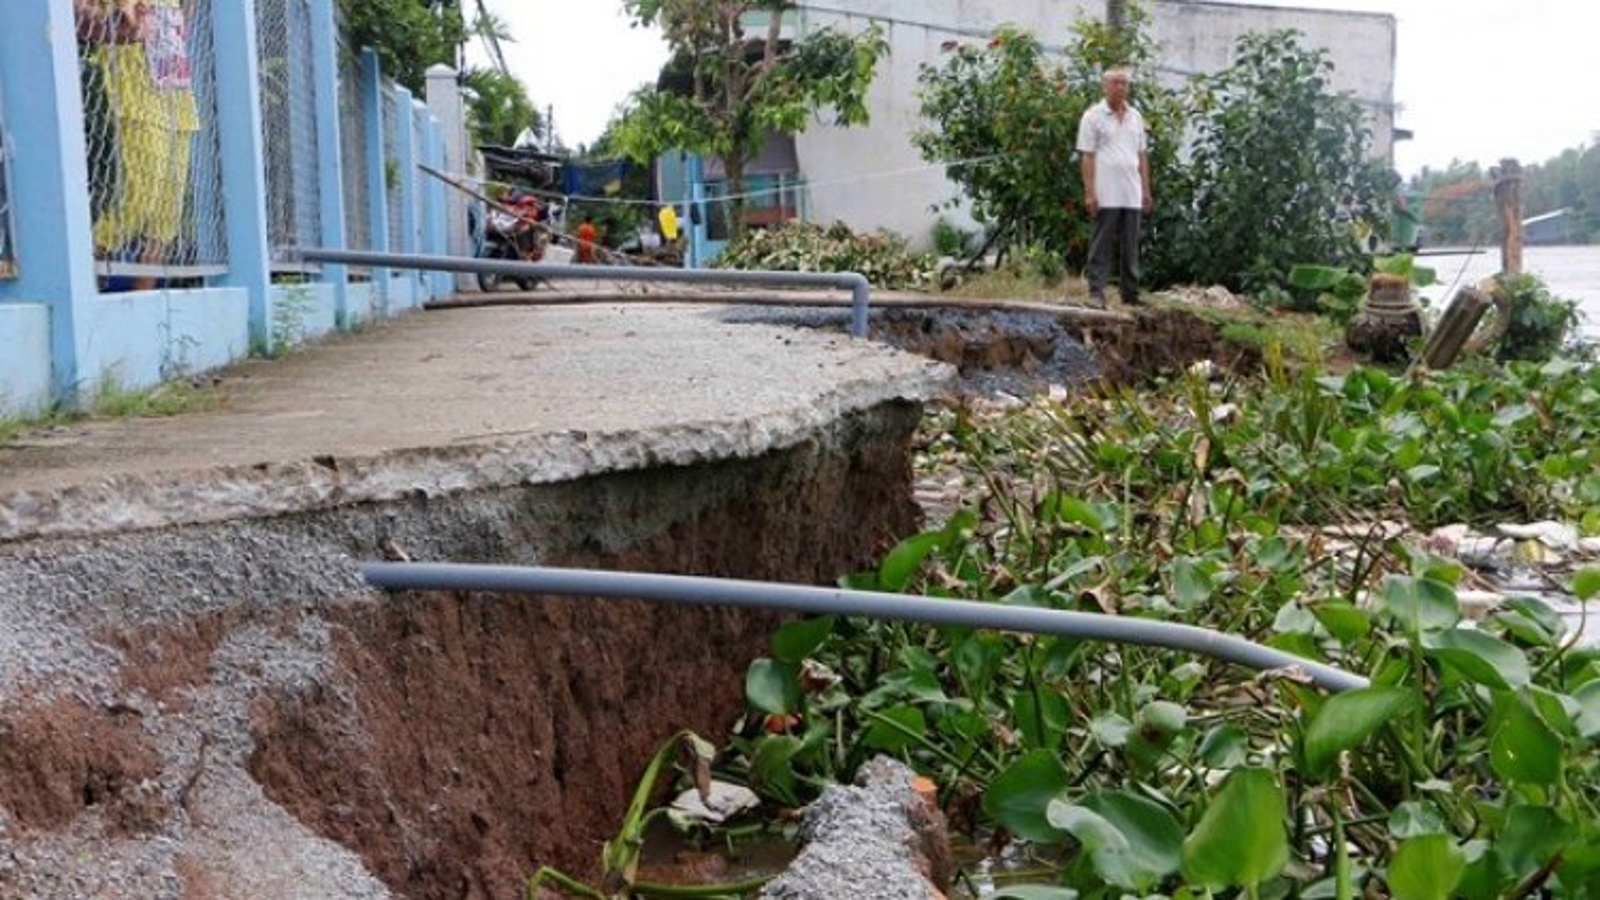 Mekong to relocate landslide-prone households